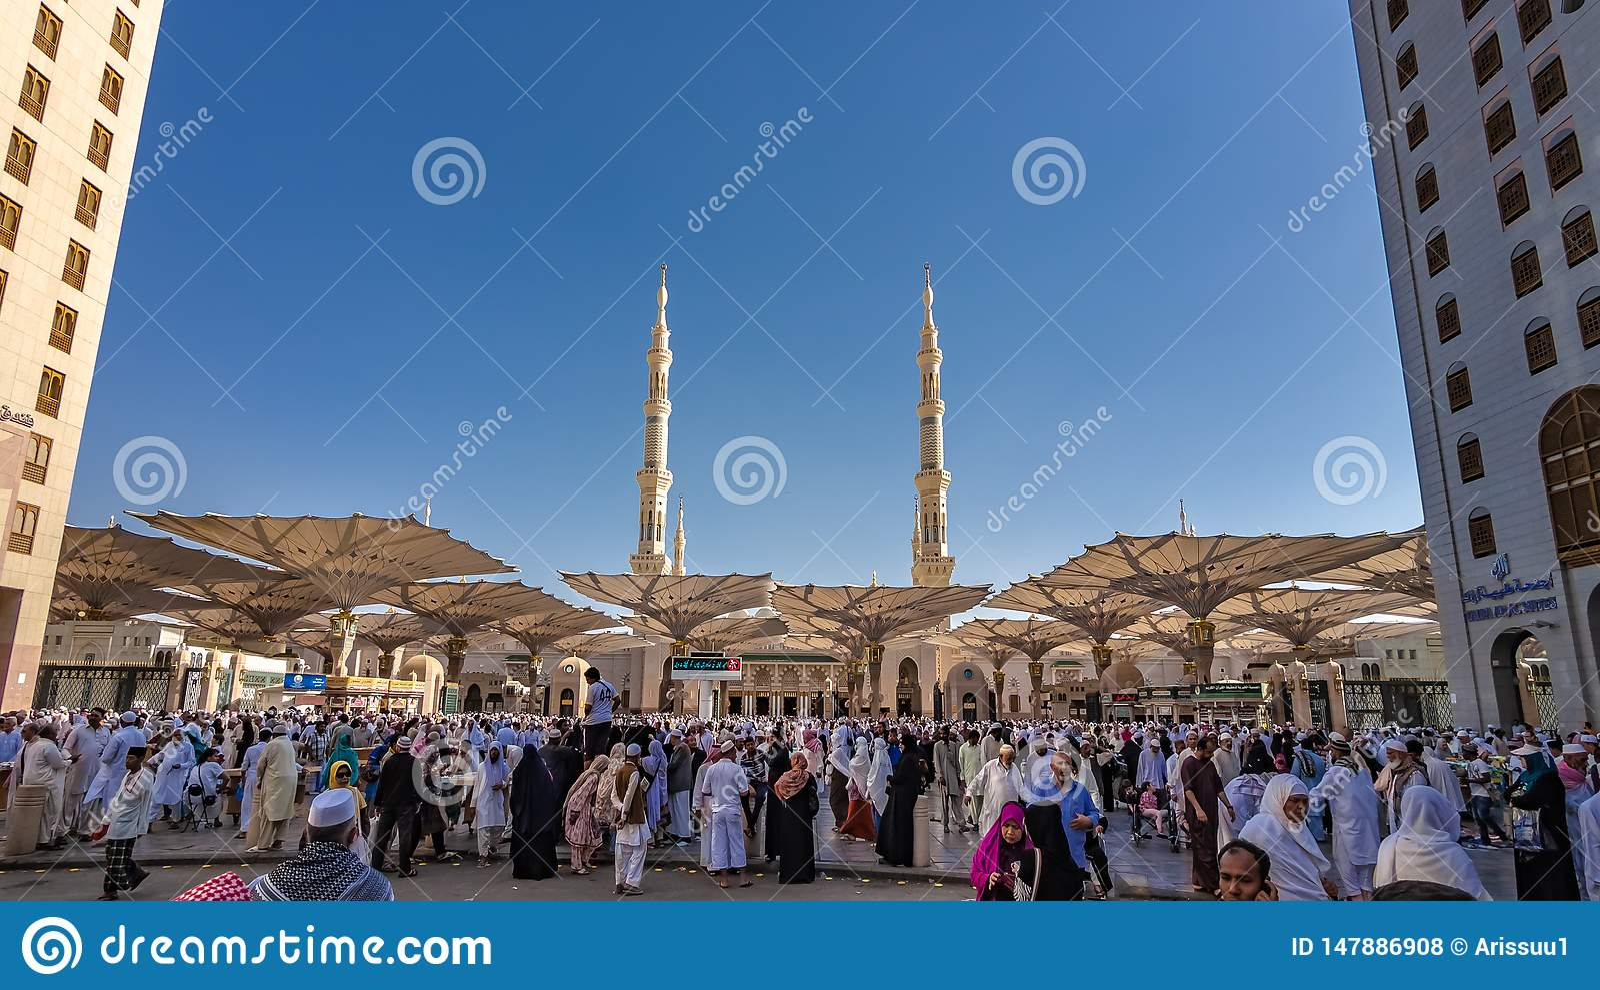 A Crowd Of Pilgrim At Medina Mosque